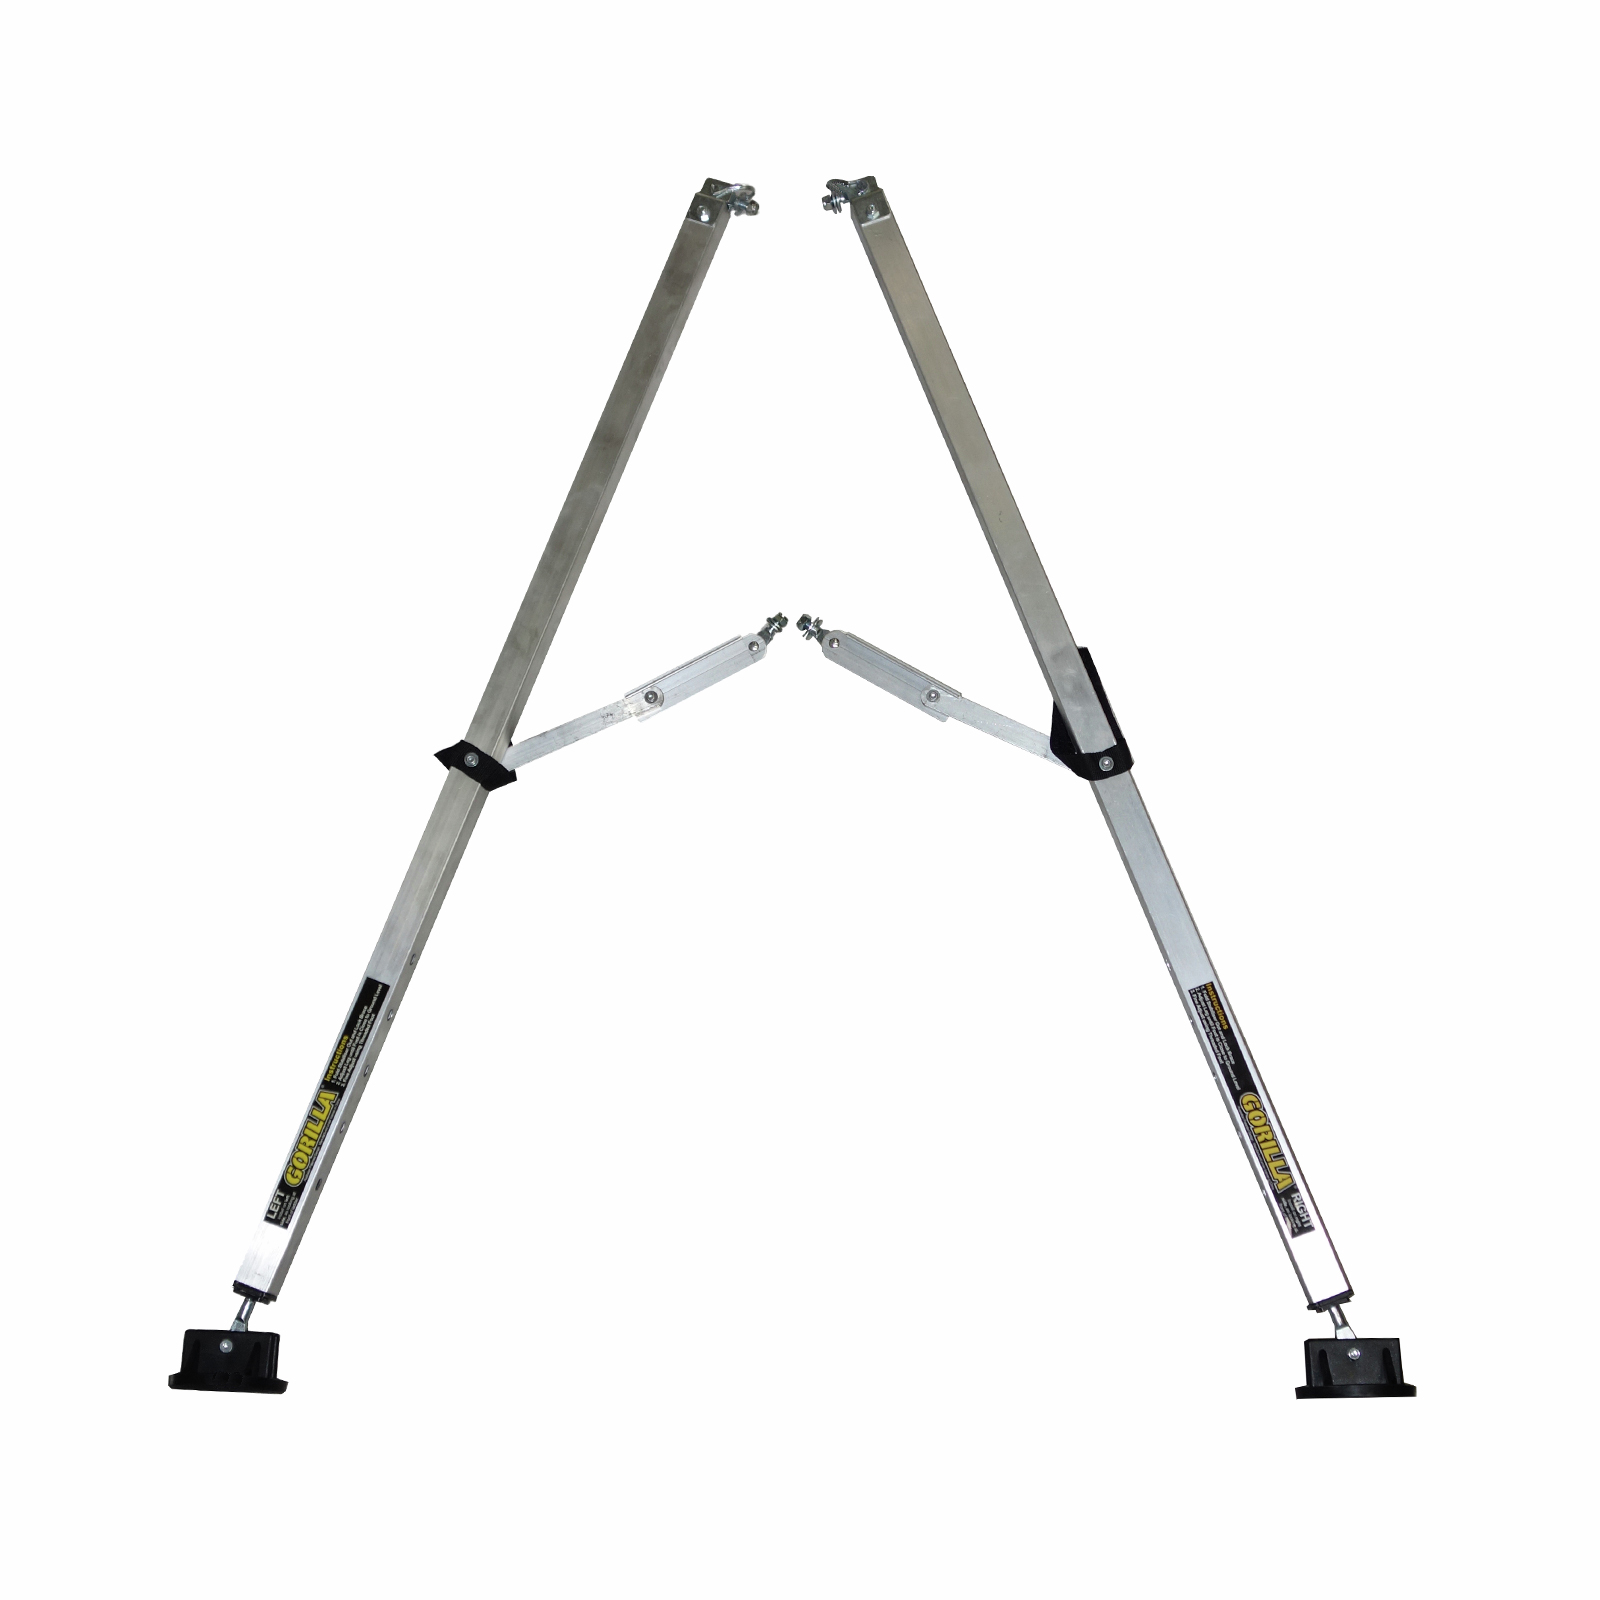 Gorilla Stabiliser Ladder Accessory - 2 Pack